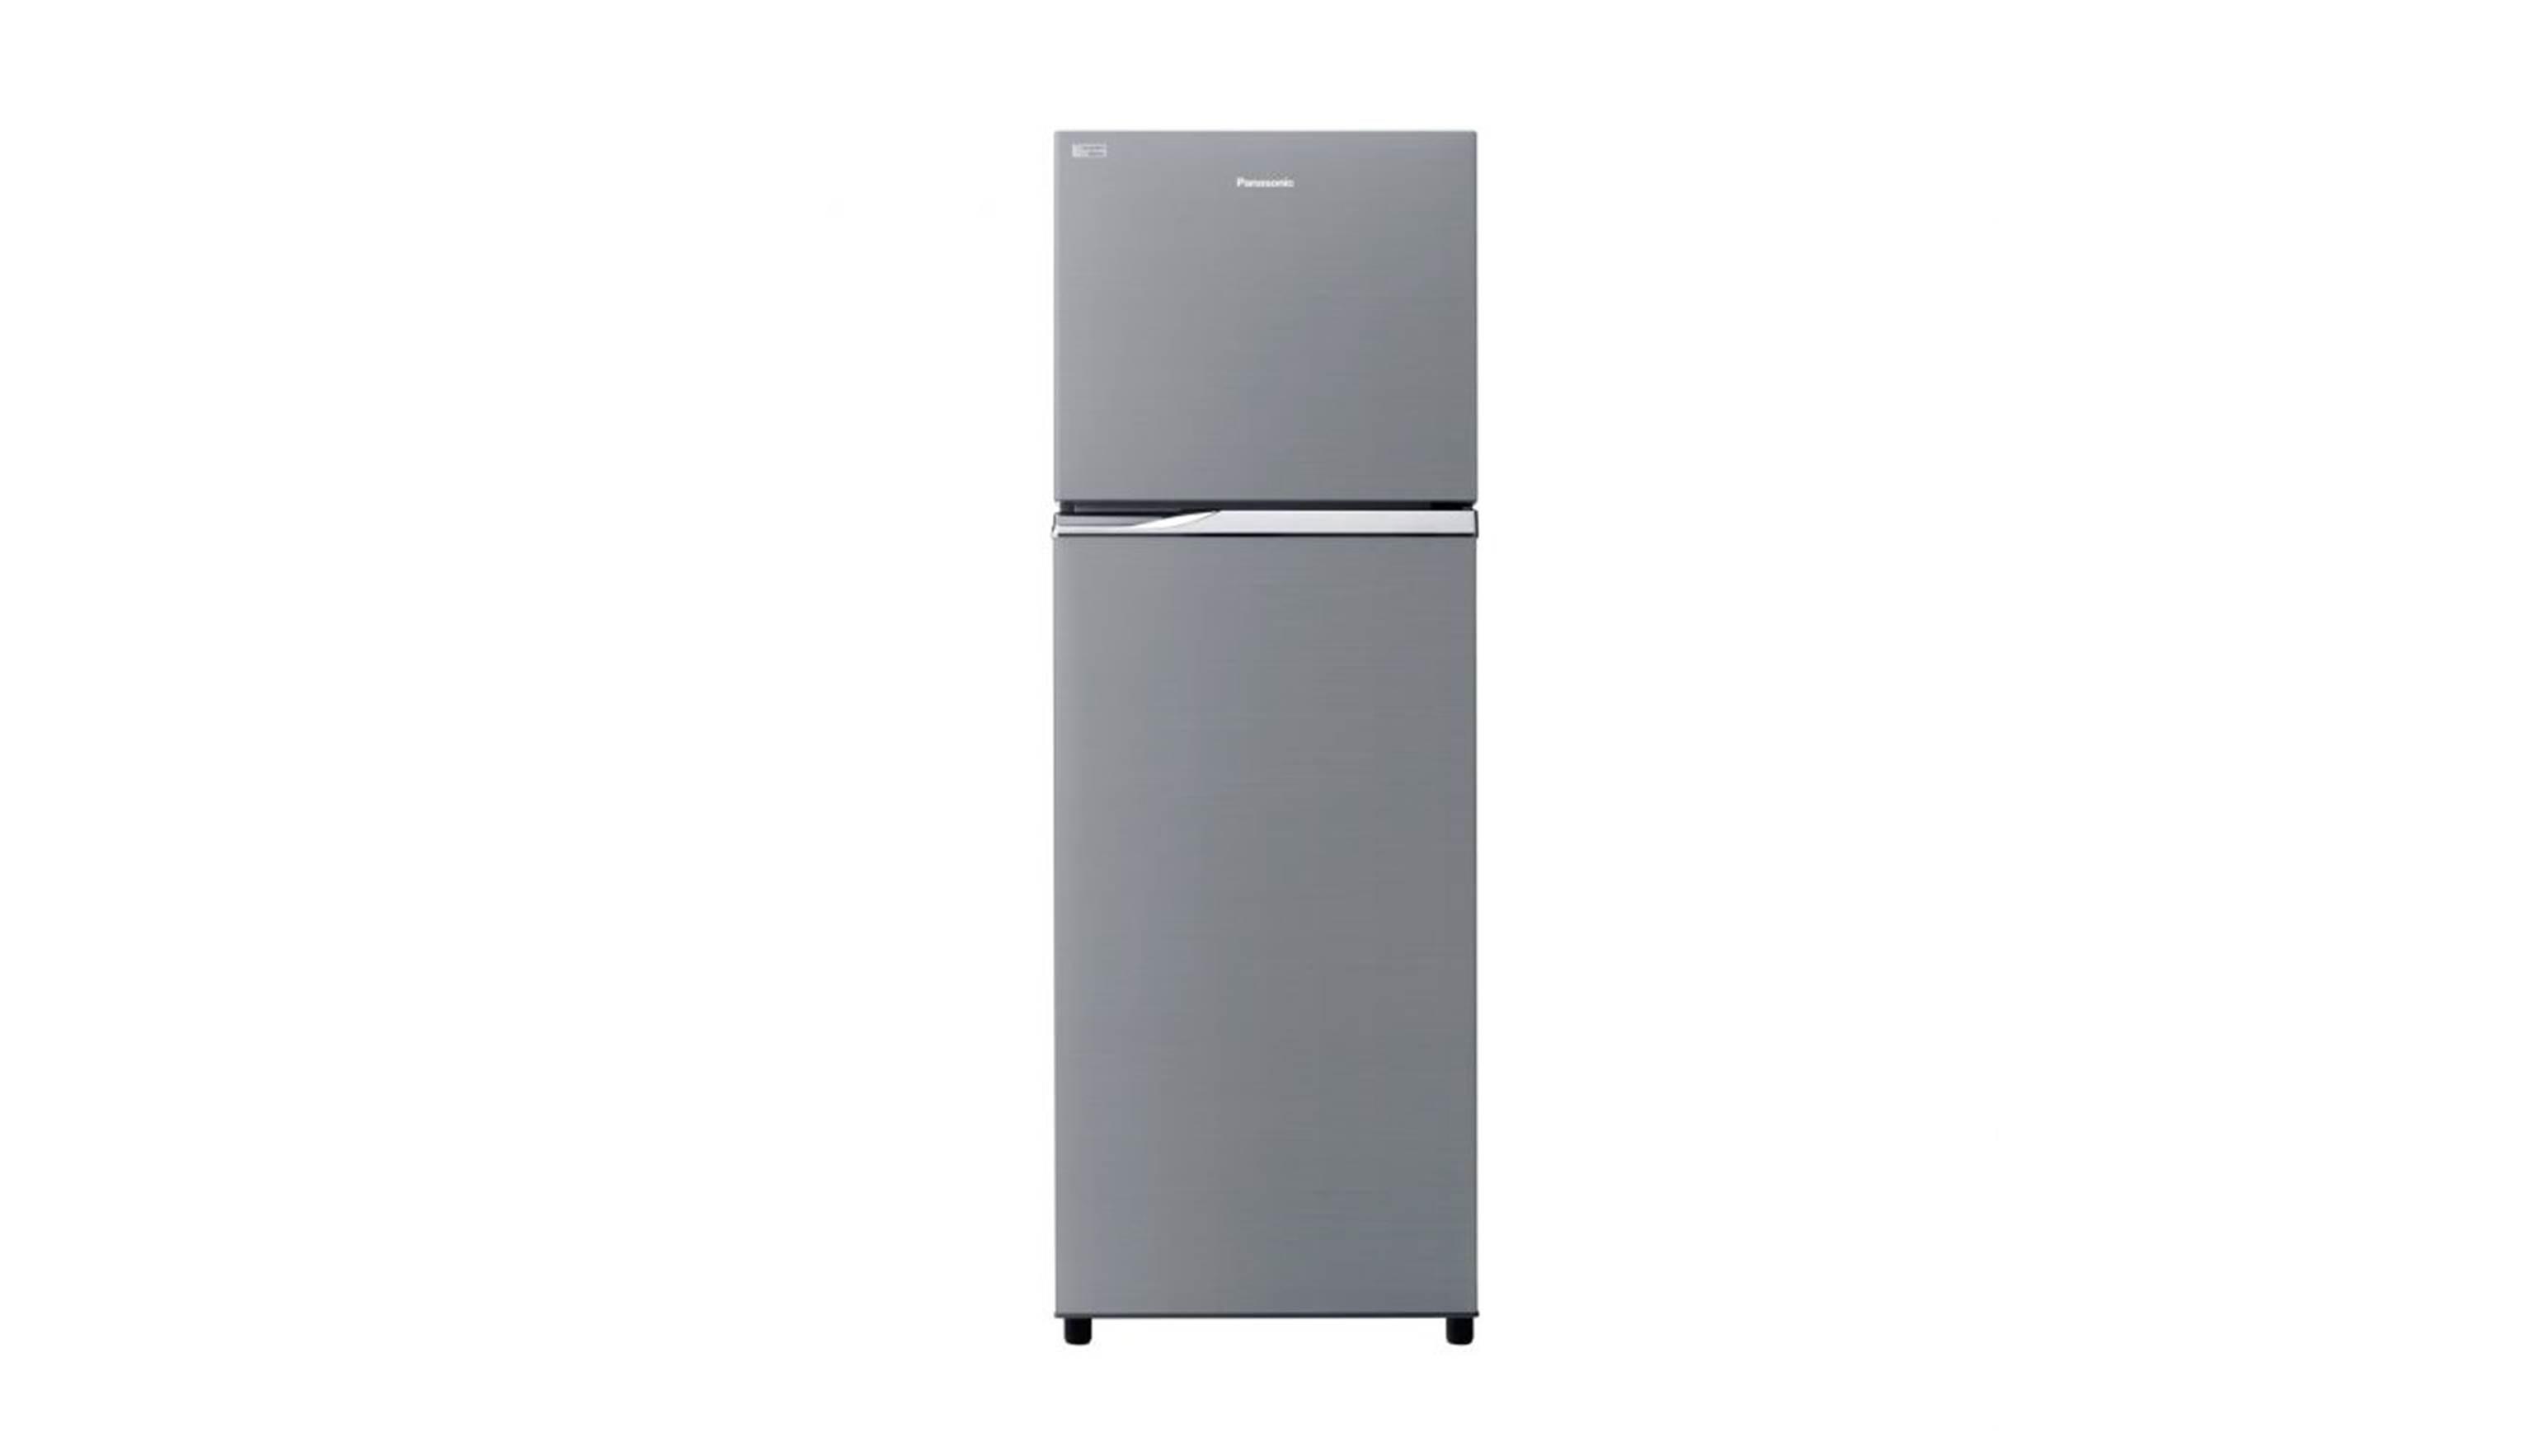 Panasonic 2-Door Refrigerator NR-BL348PSSG - Front View